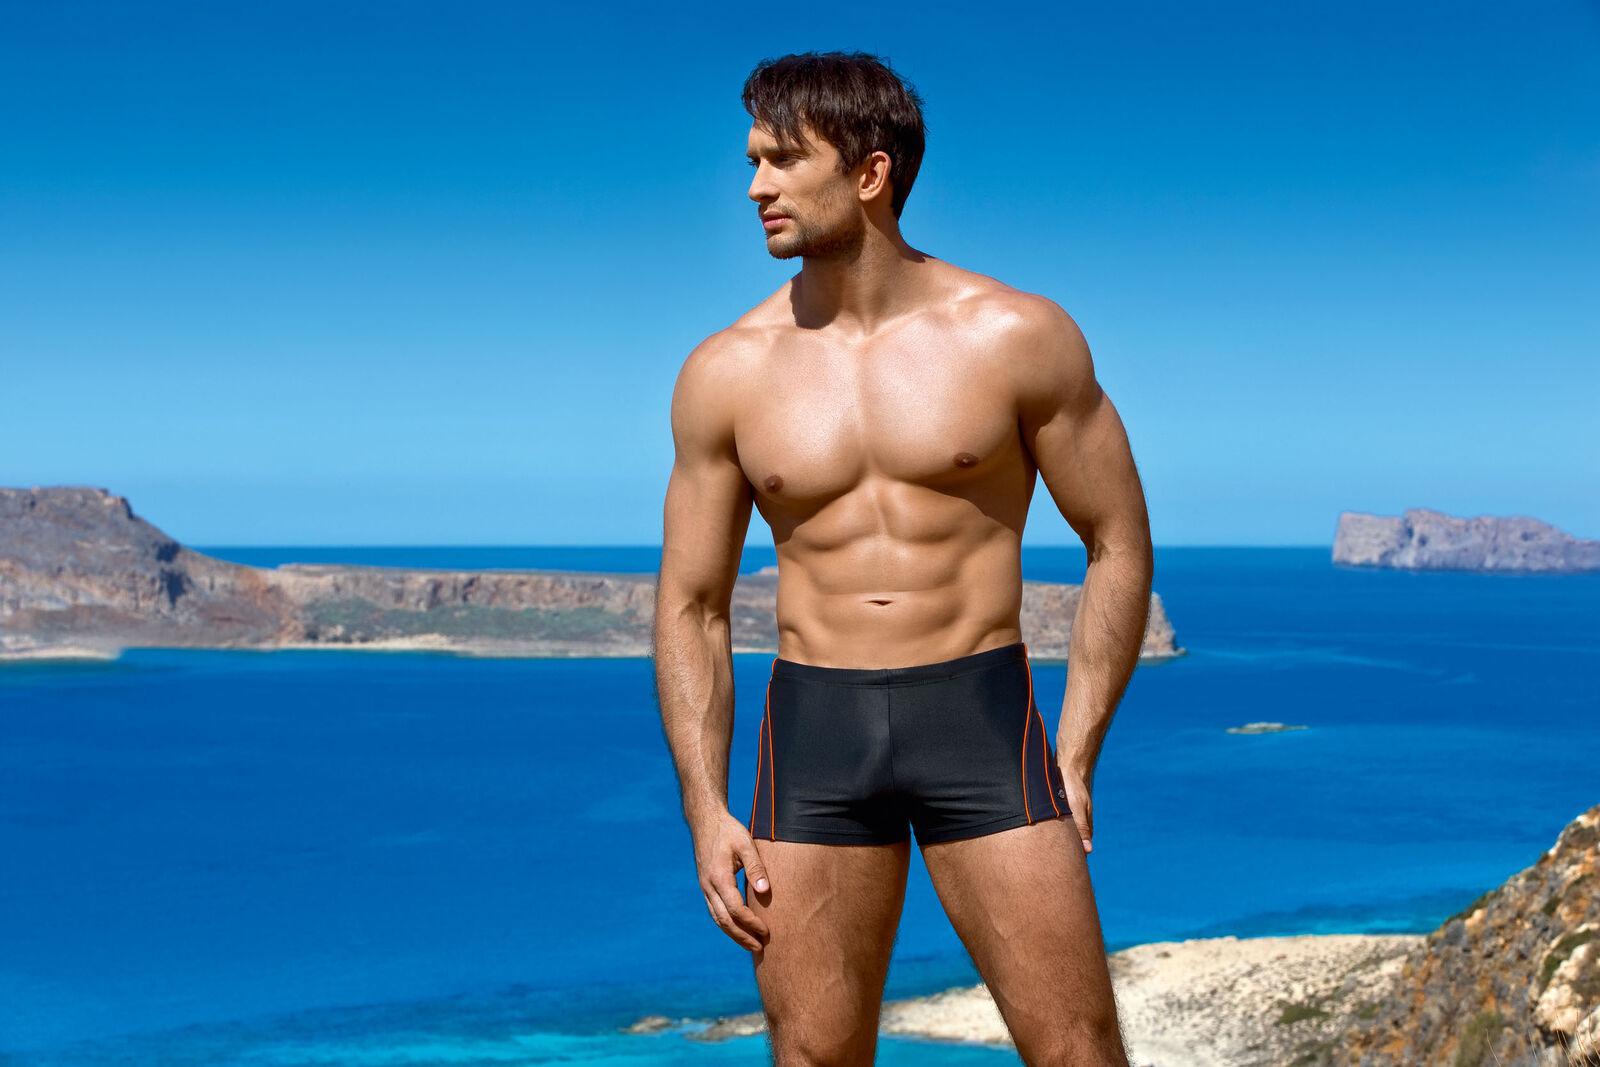 757a6c9806957 Men's fashion swimming trunks boxers swim shorts beach swimwear | eBay